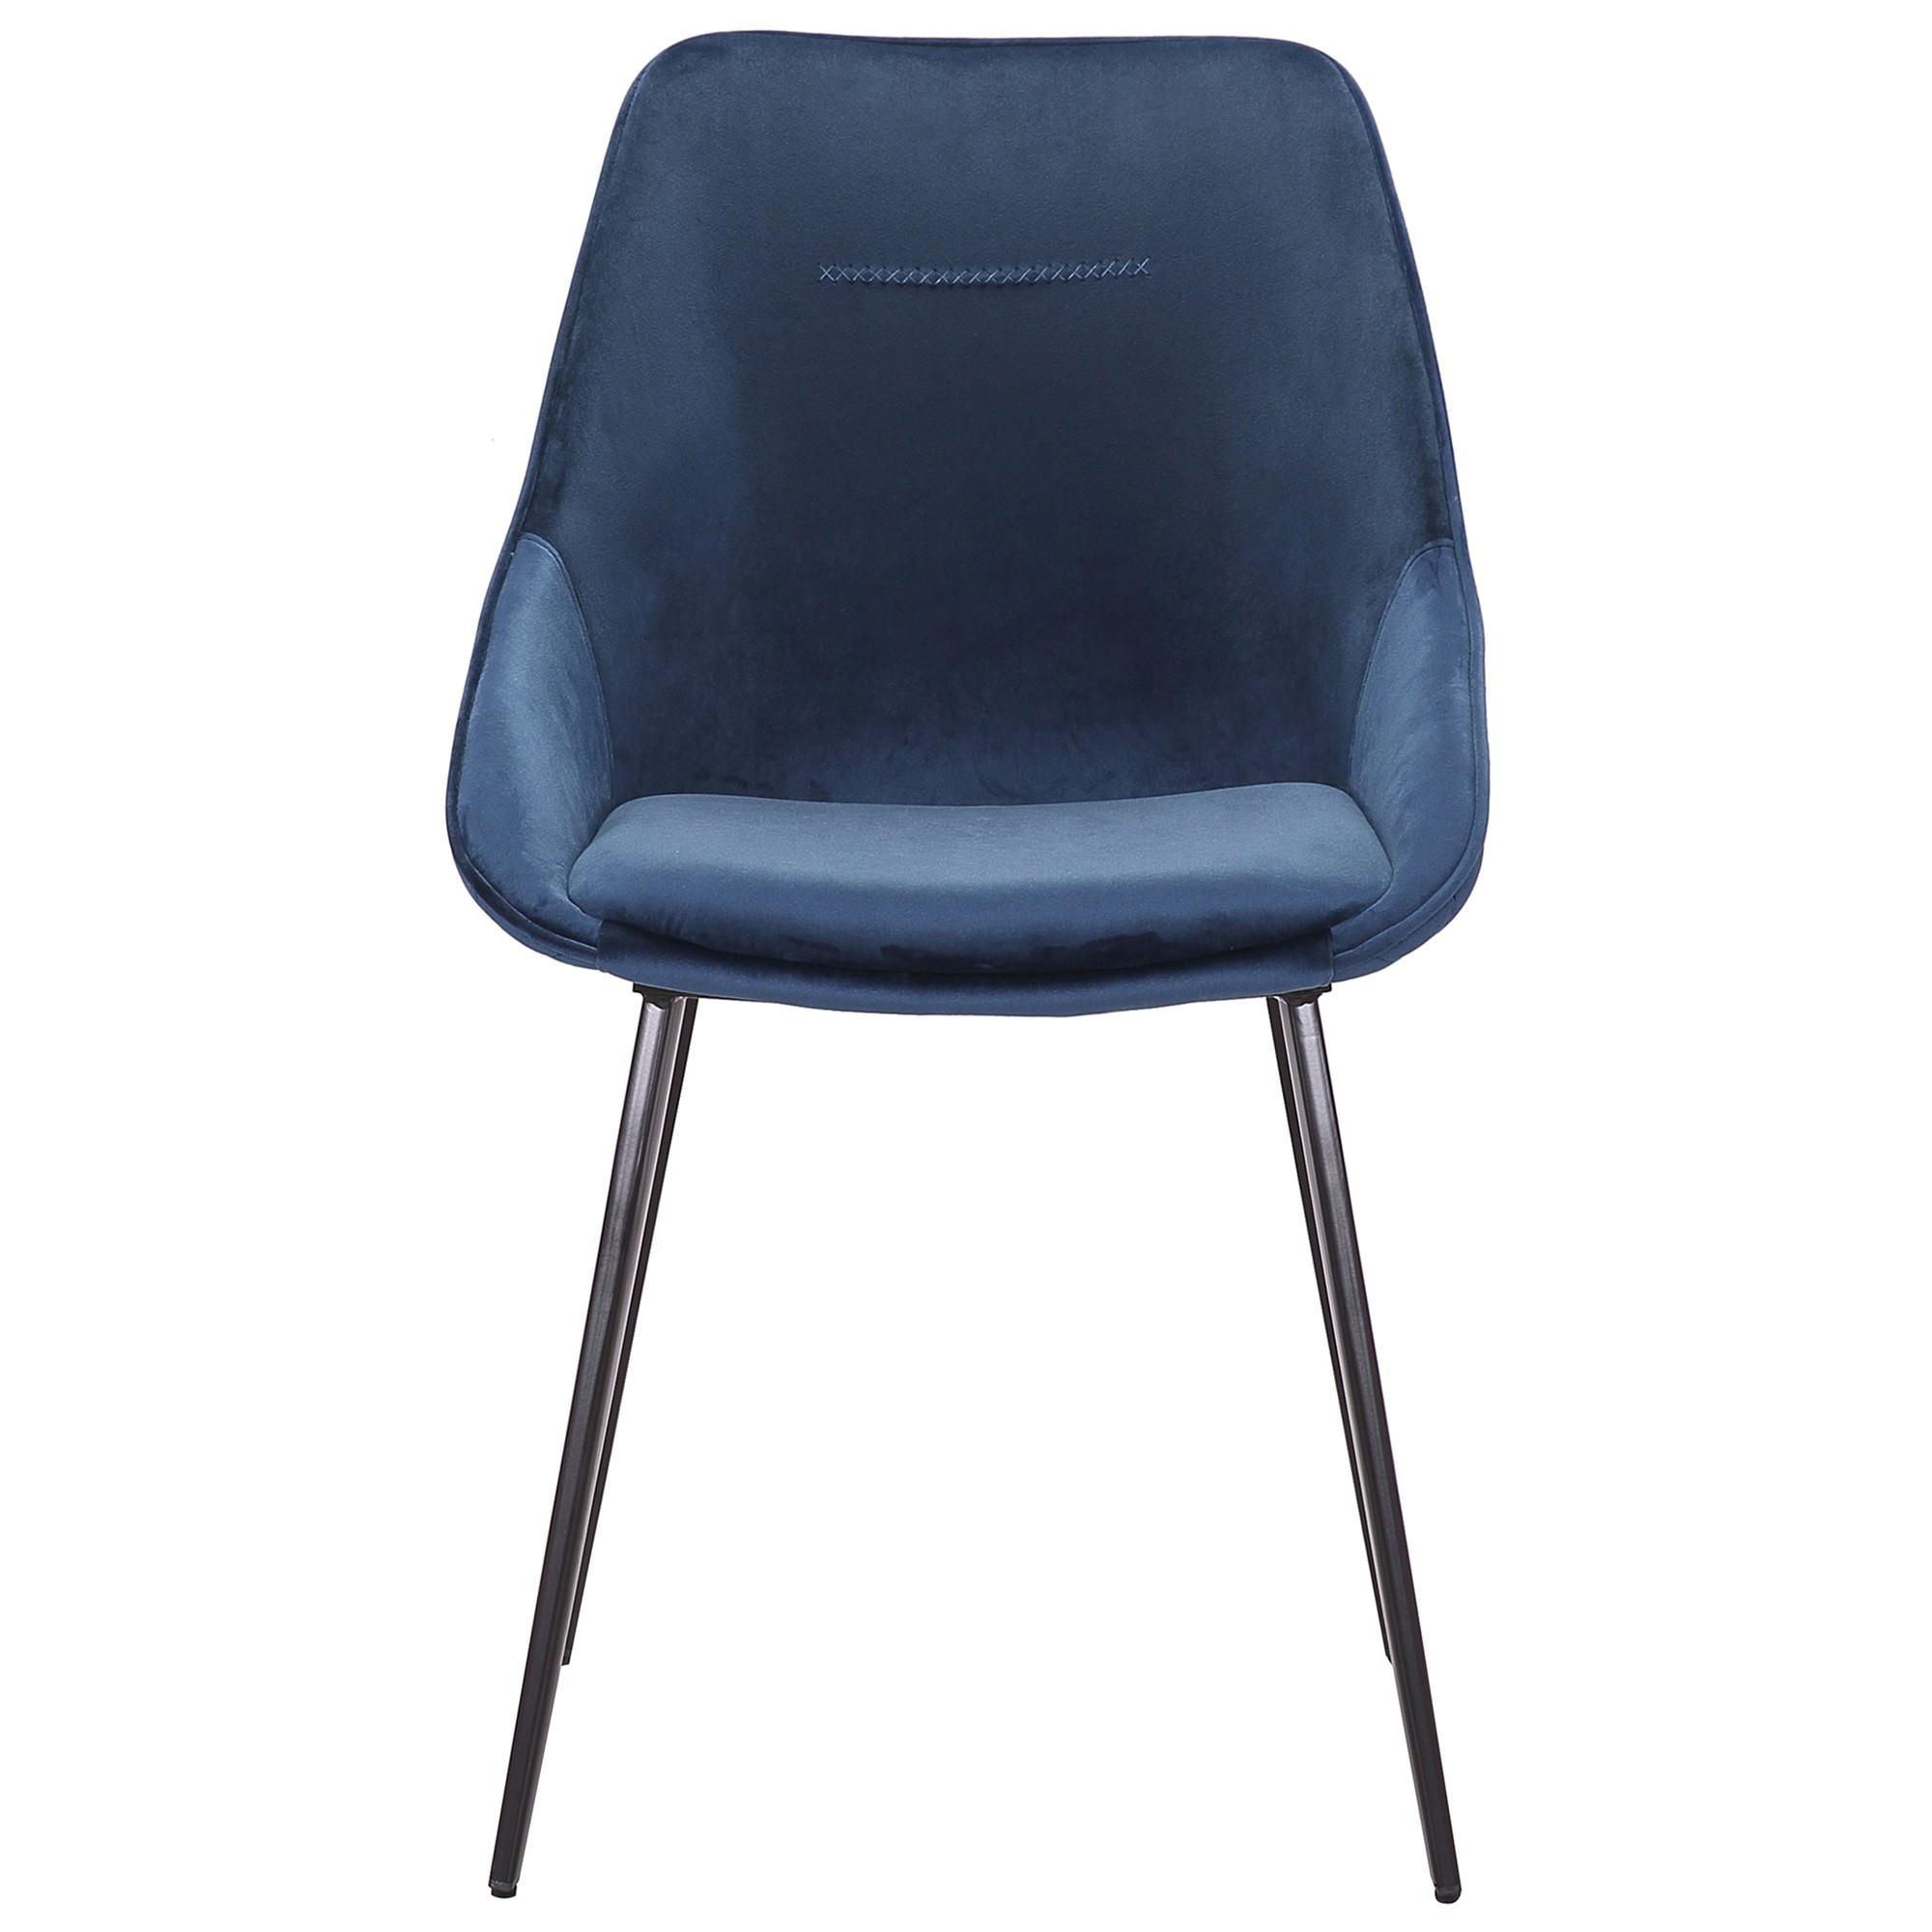 Bellagio Commercial Grade Velvet Fabric Dining Chair, Navy